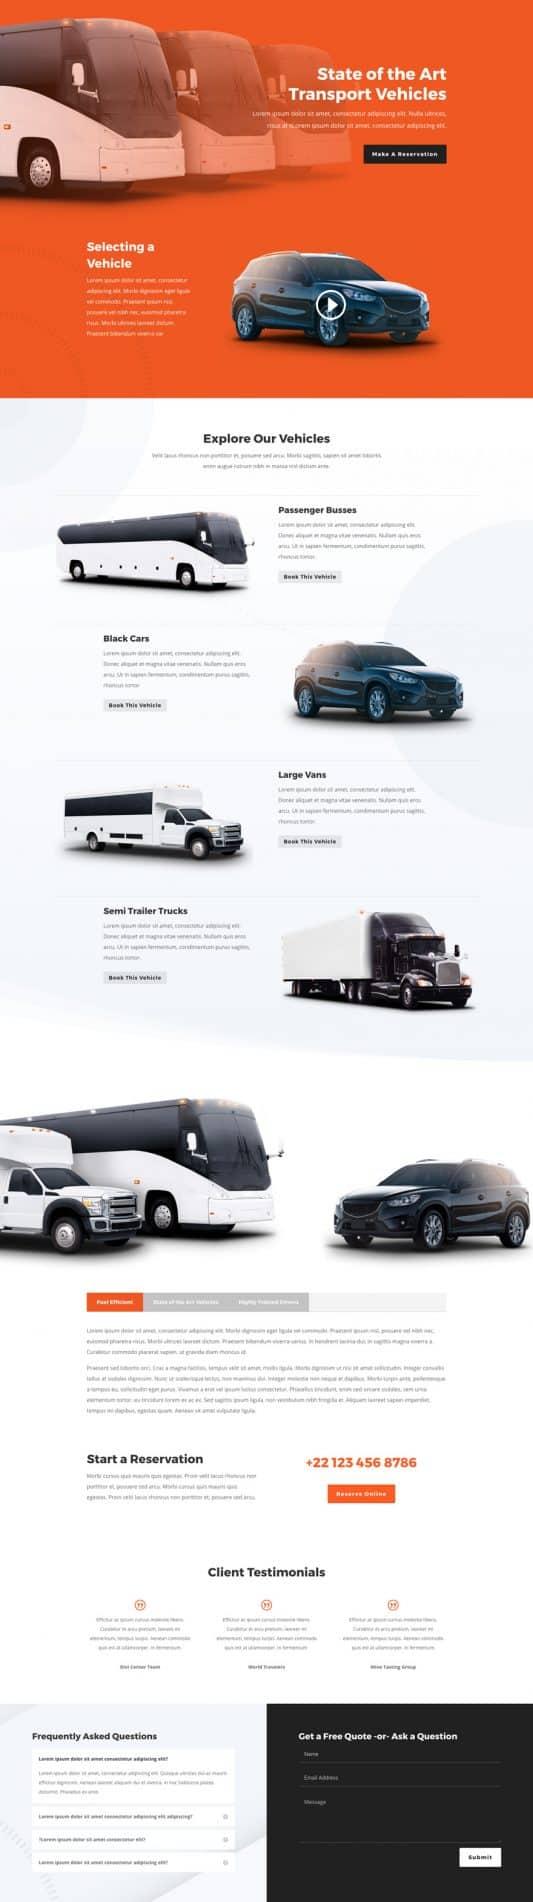 Transportation Services Web Design 6